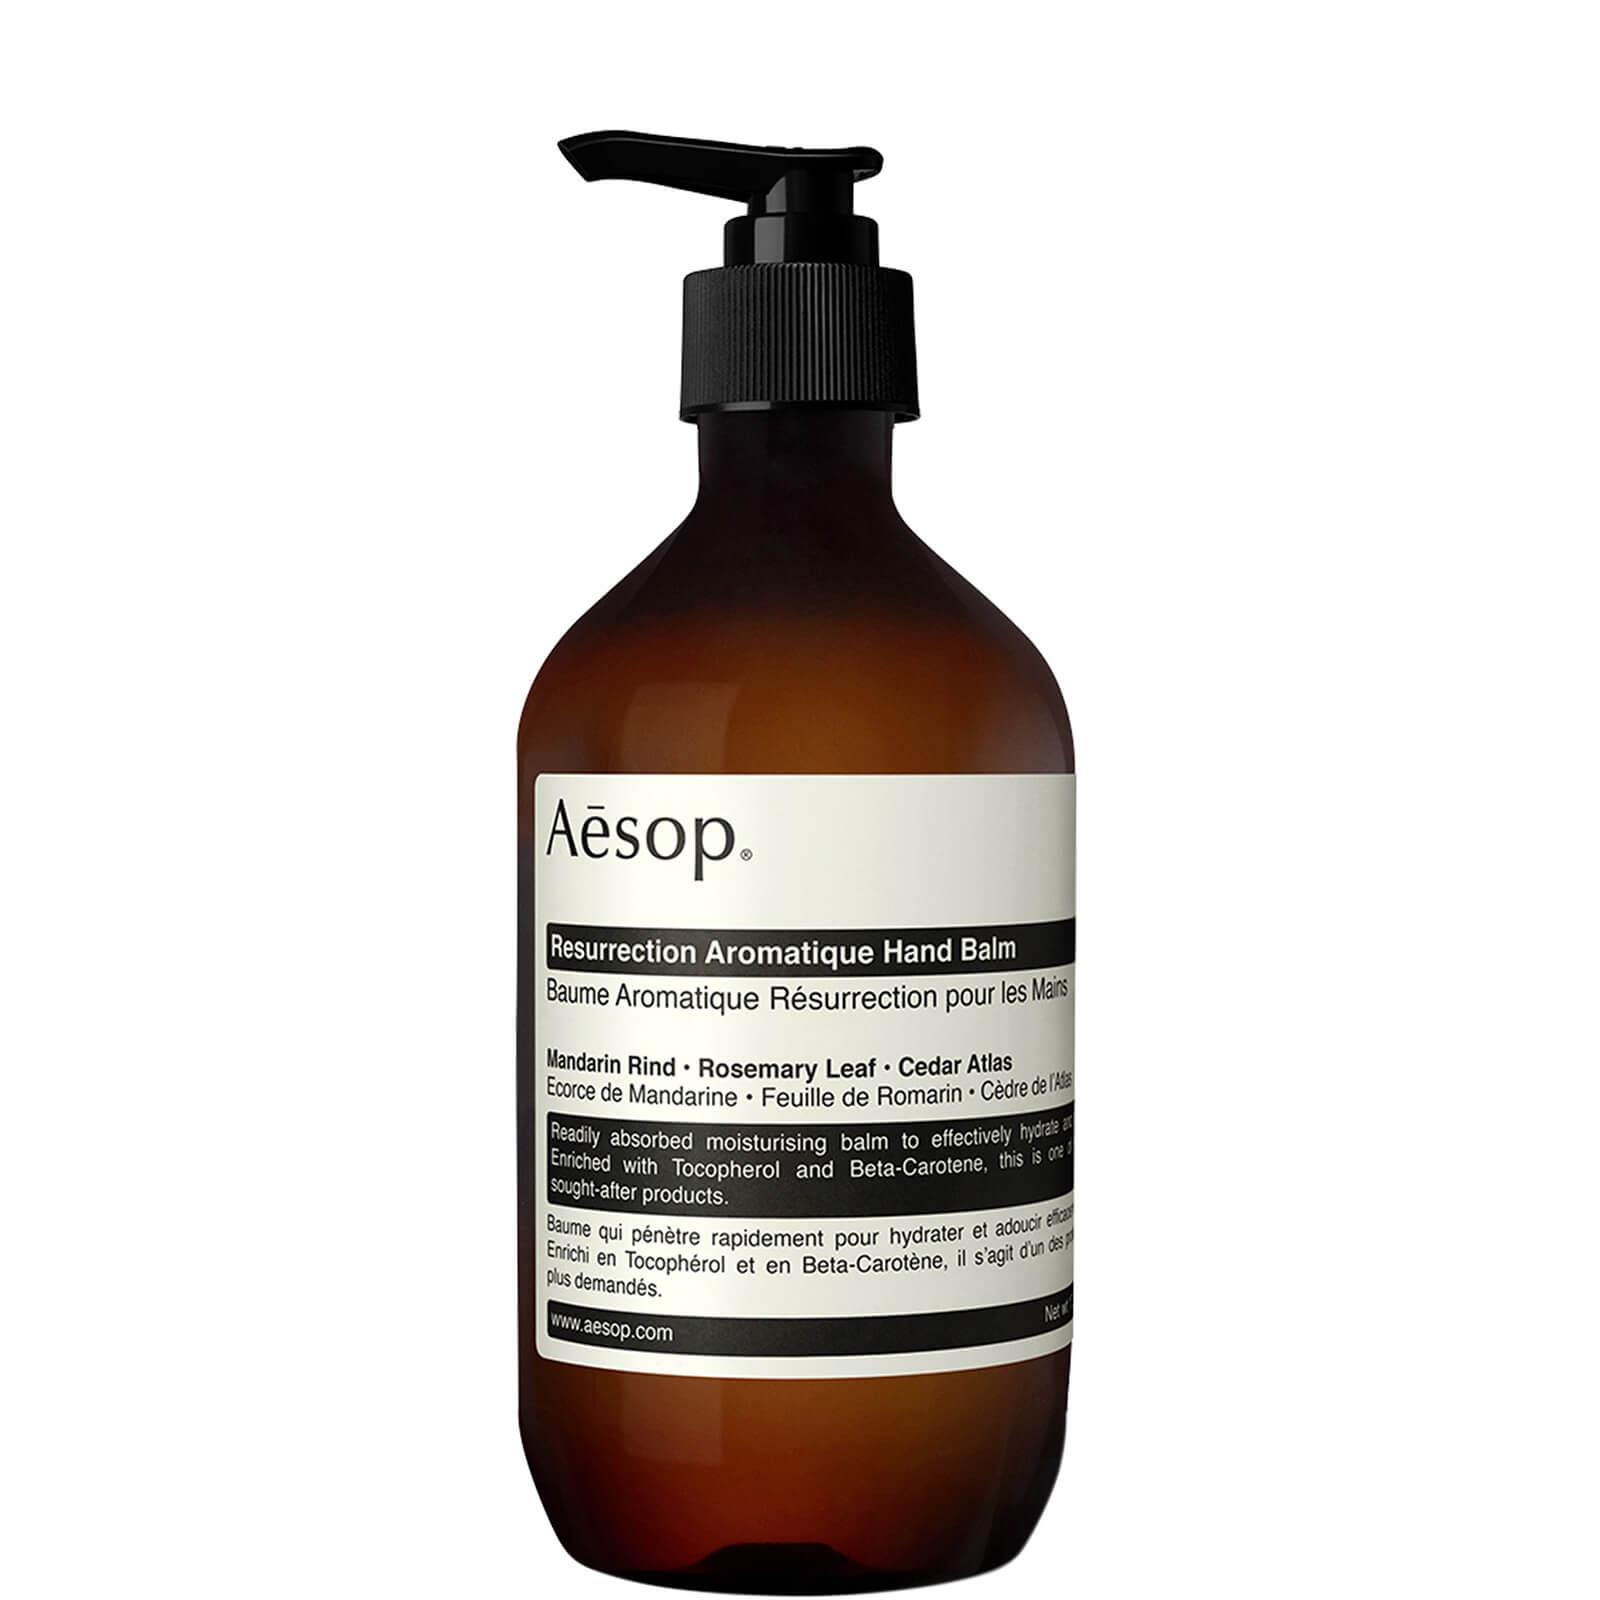 Купить Aesop Ressurection Aromatique Hand Balm 500ml